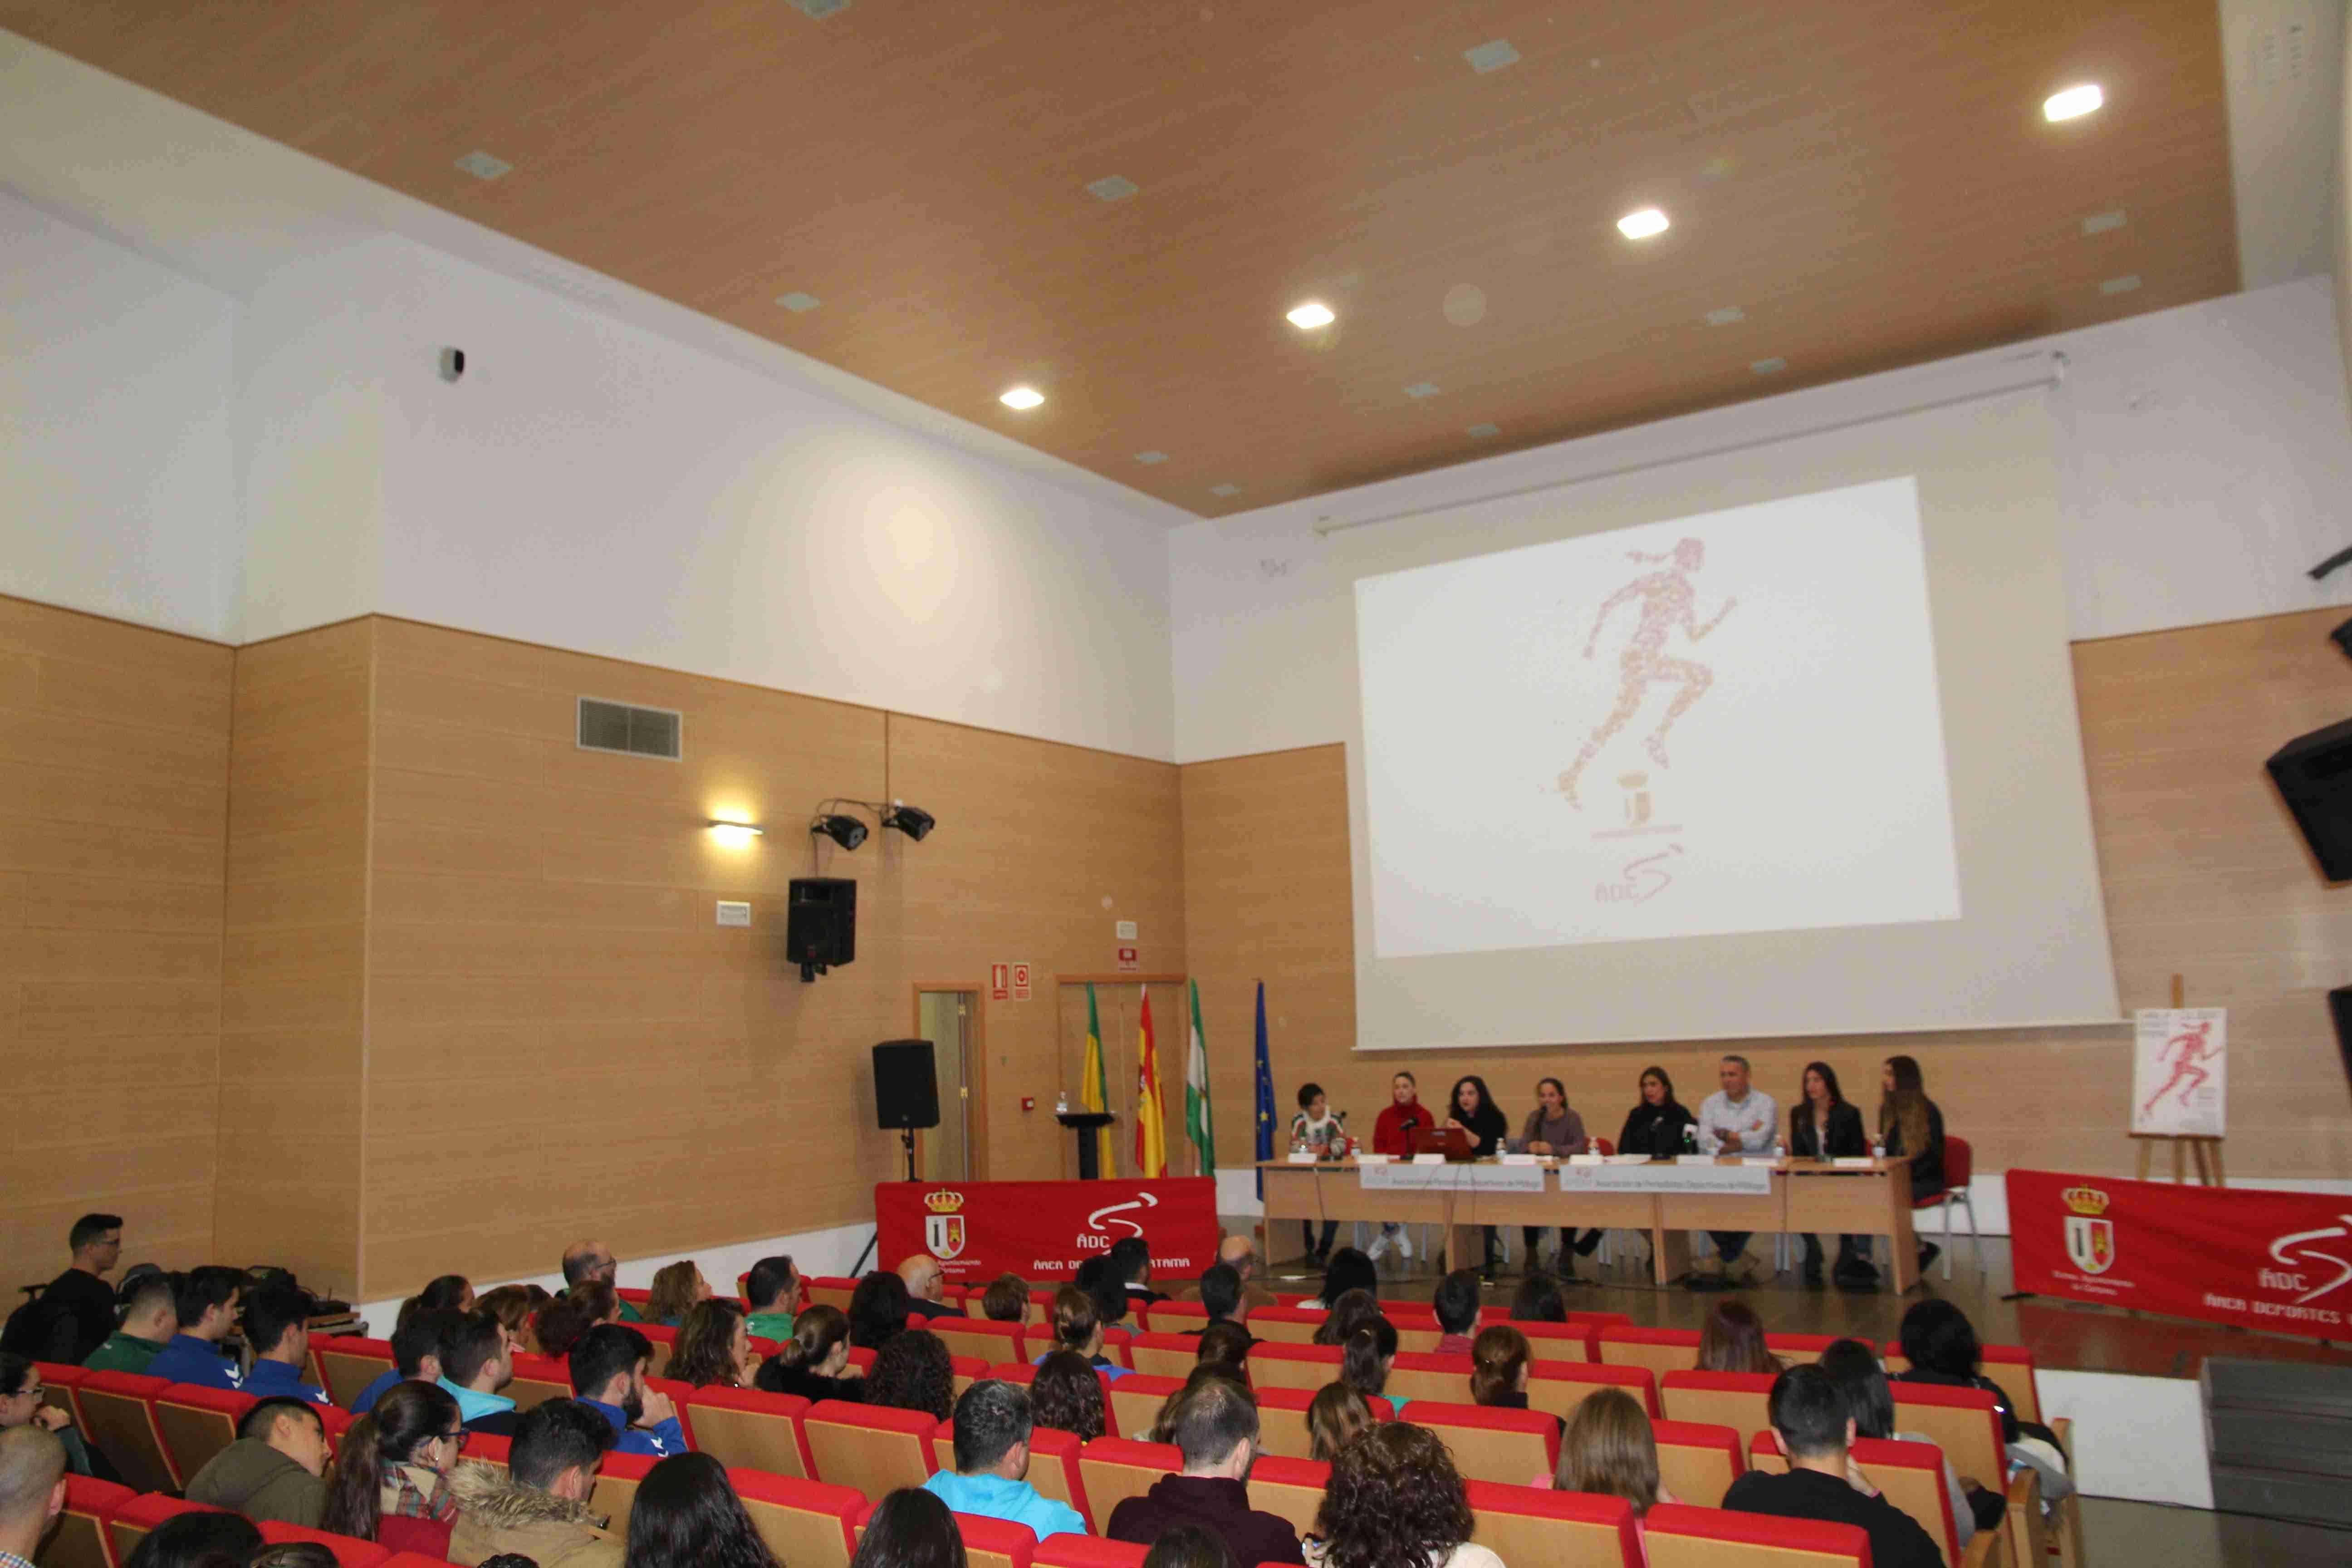 charla-coloquio-deporte-femenino-110119-13